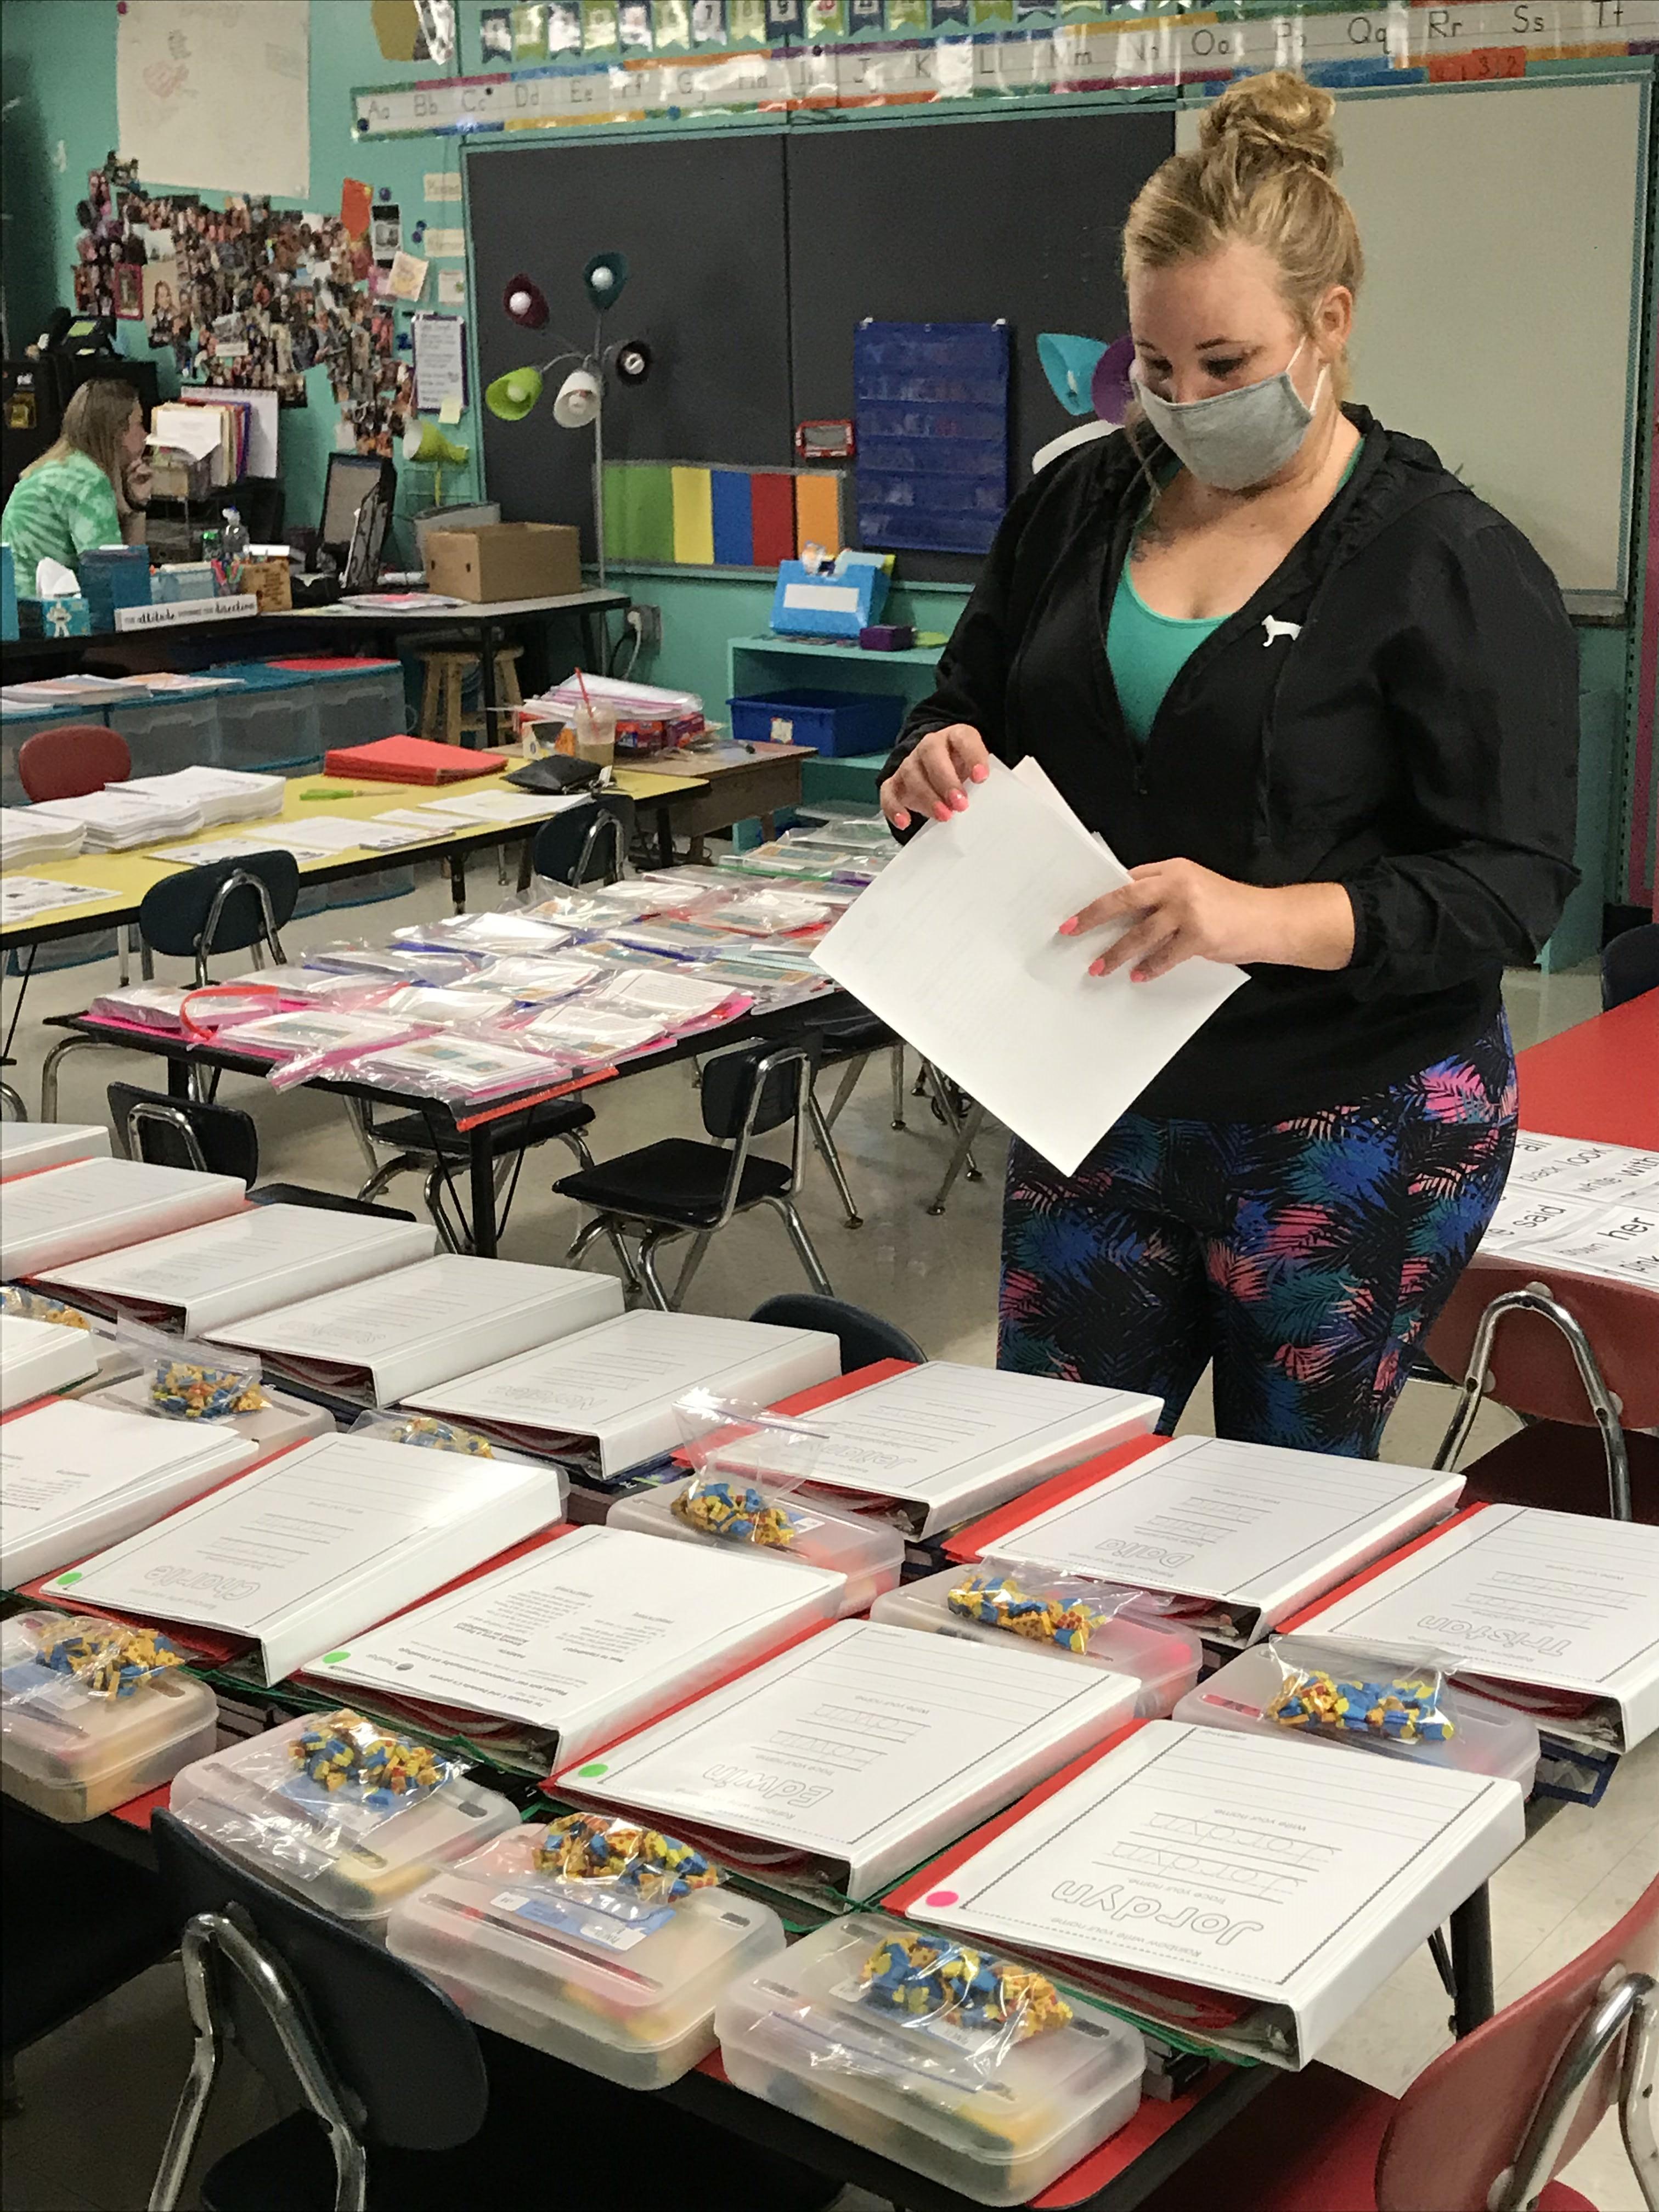 Staff Prepares for 2020-21 School Year